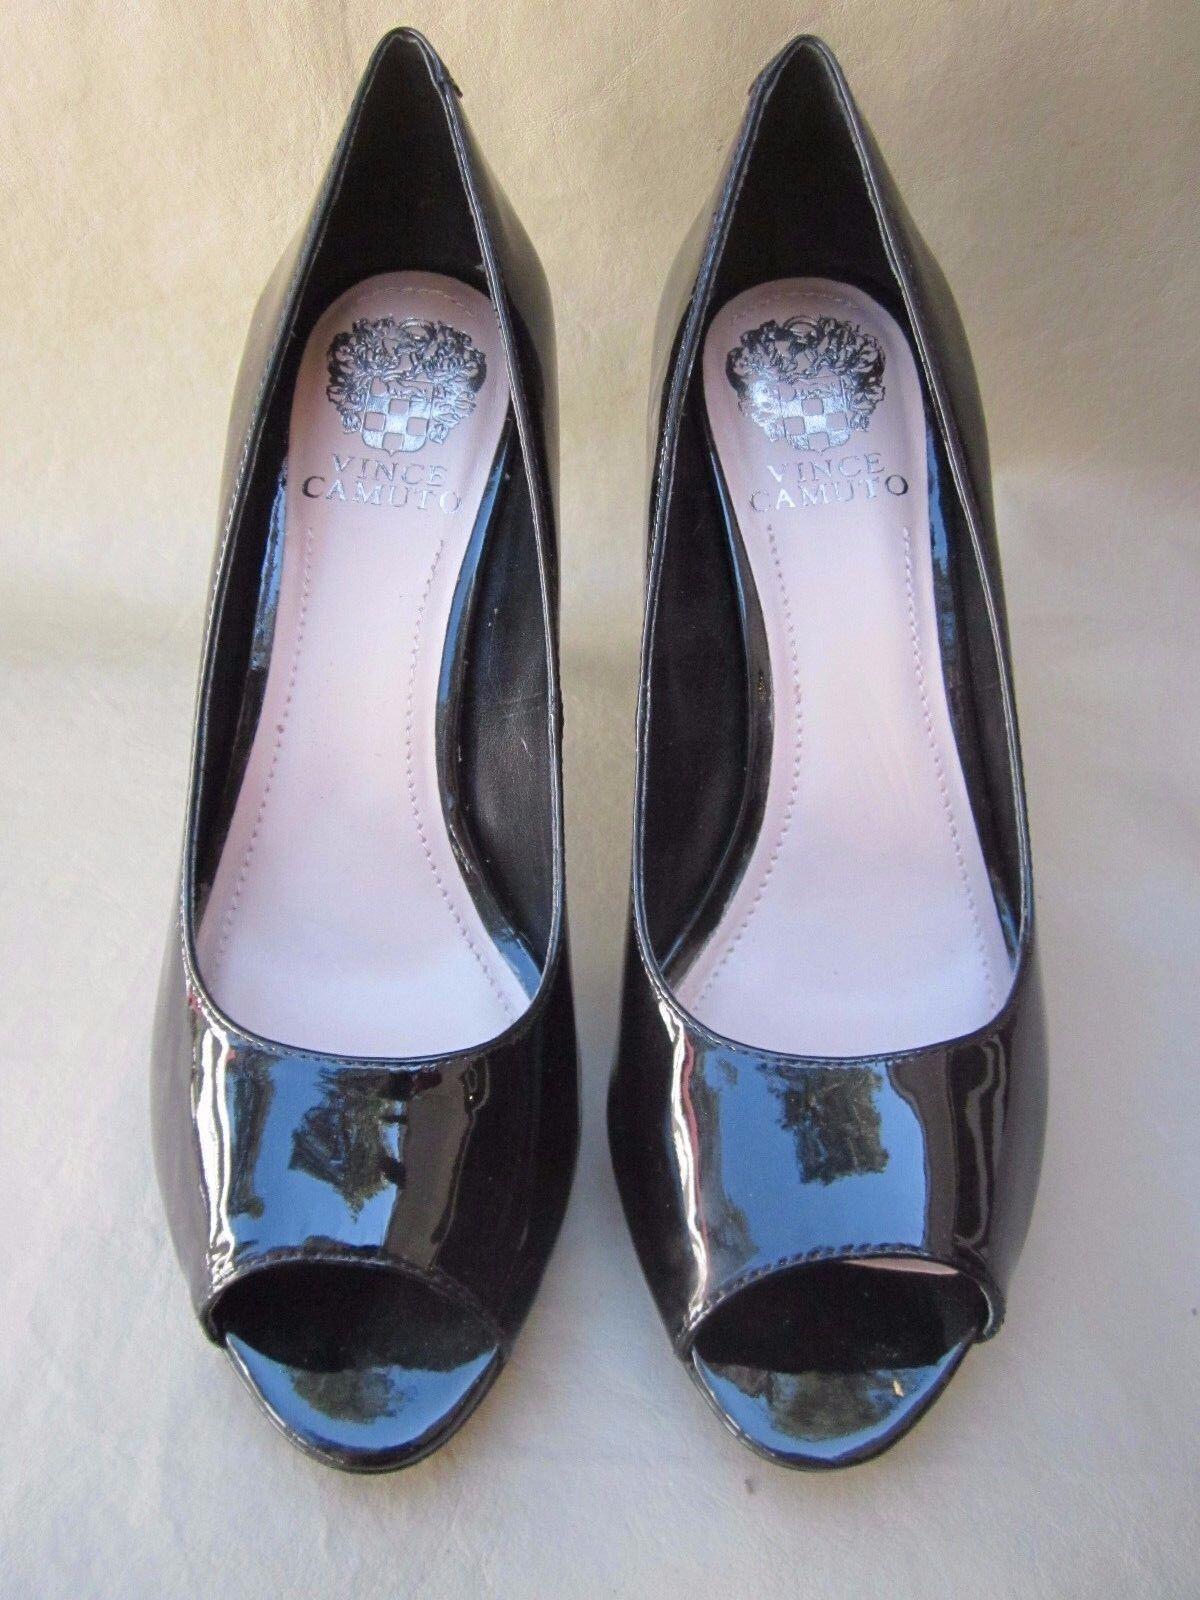 Vince Camuto  femme escarpins chaussures noir cuir verni 7.5 m USA 37.5 Euro Nice